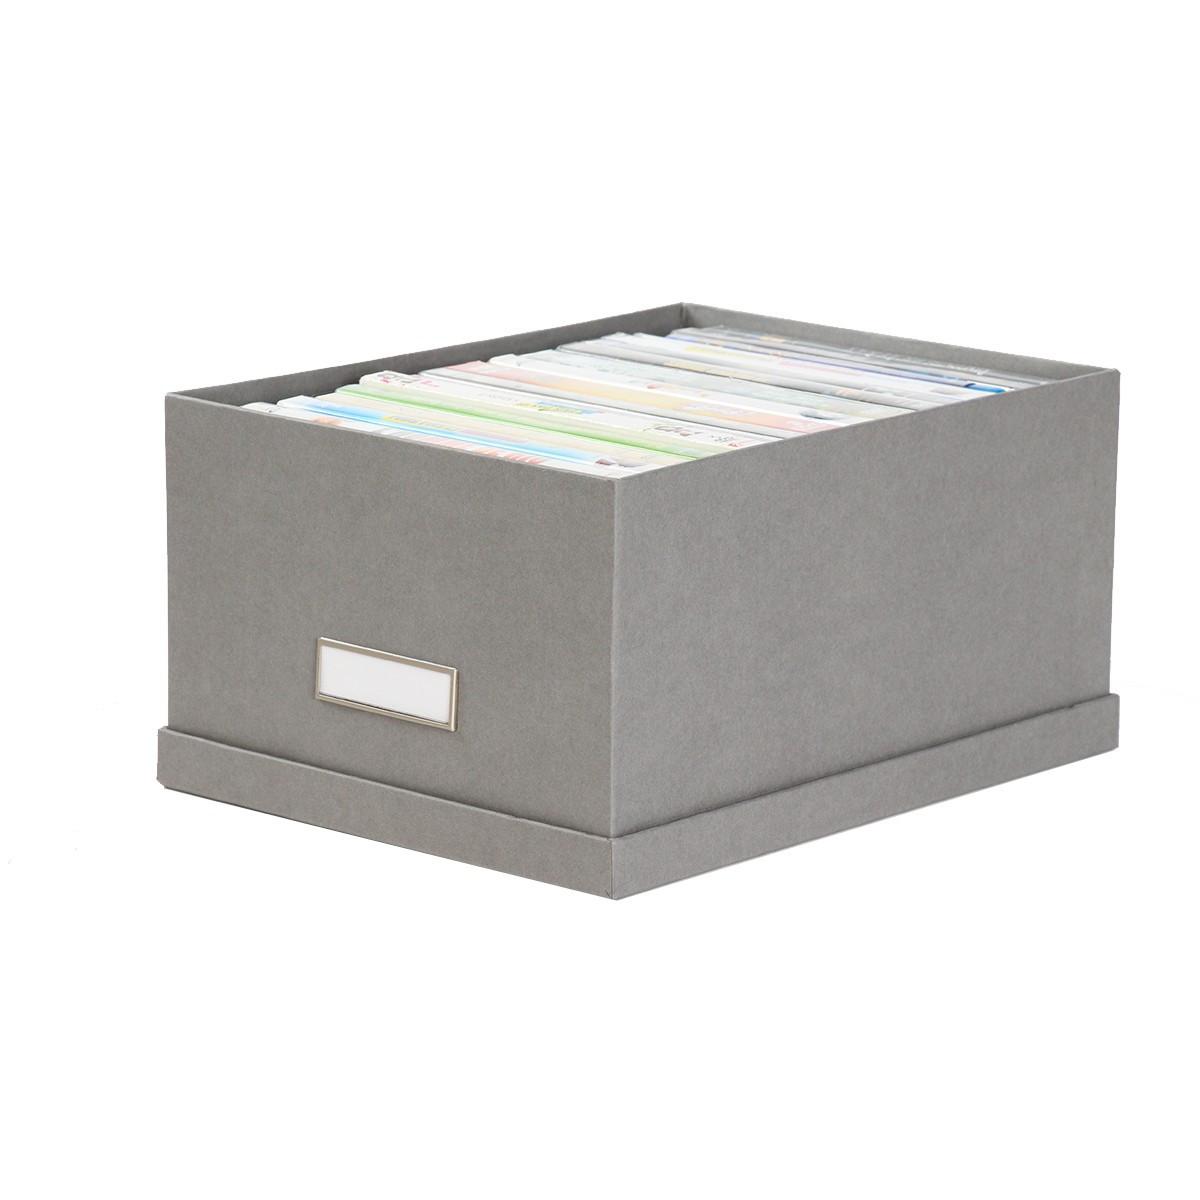 bo te dvd en carton gris rangement son et image. Black Bedroom Furniture Sets. Home Design Ideas